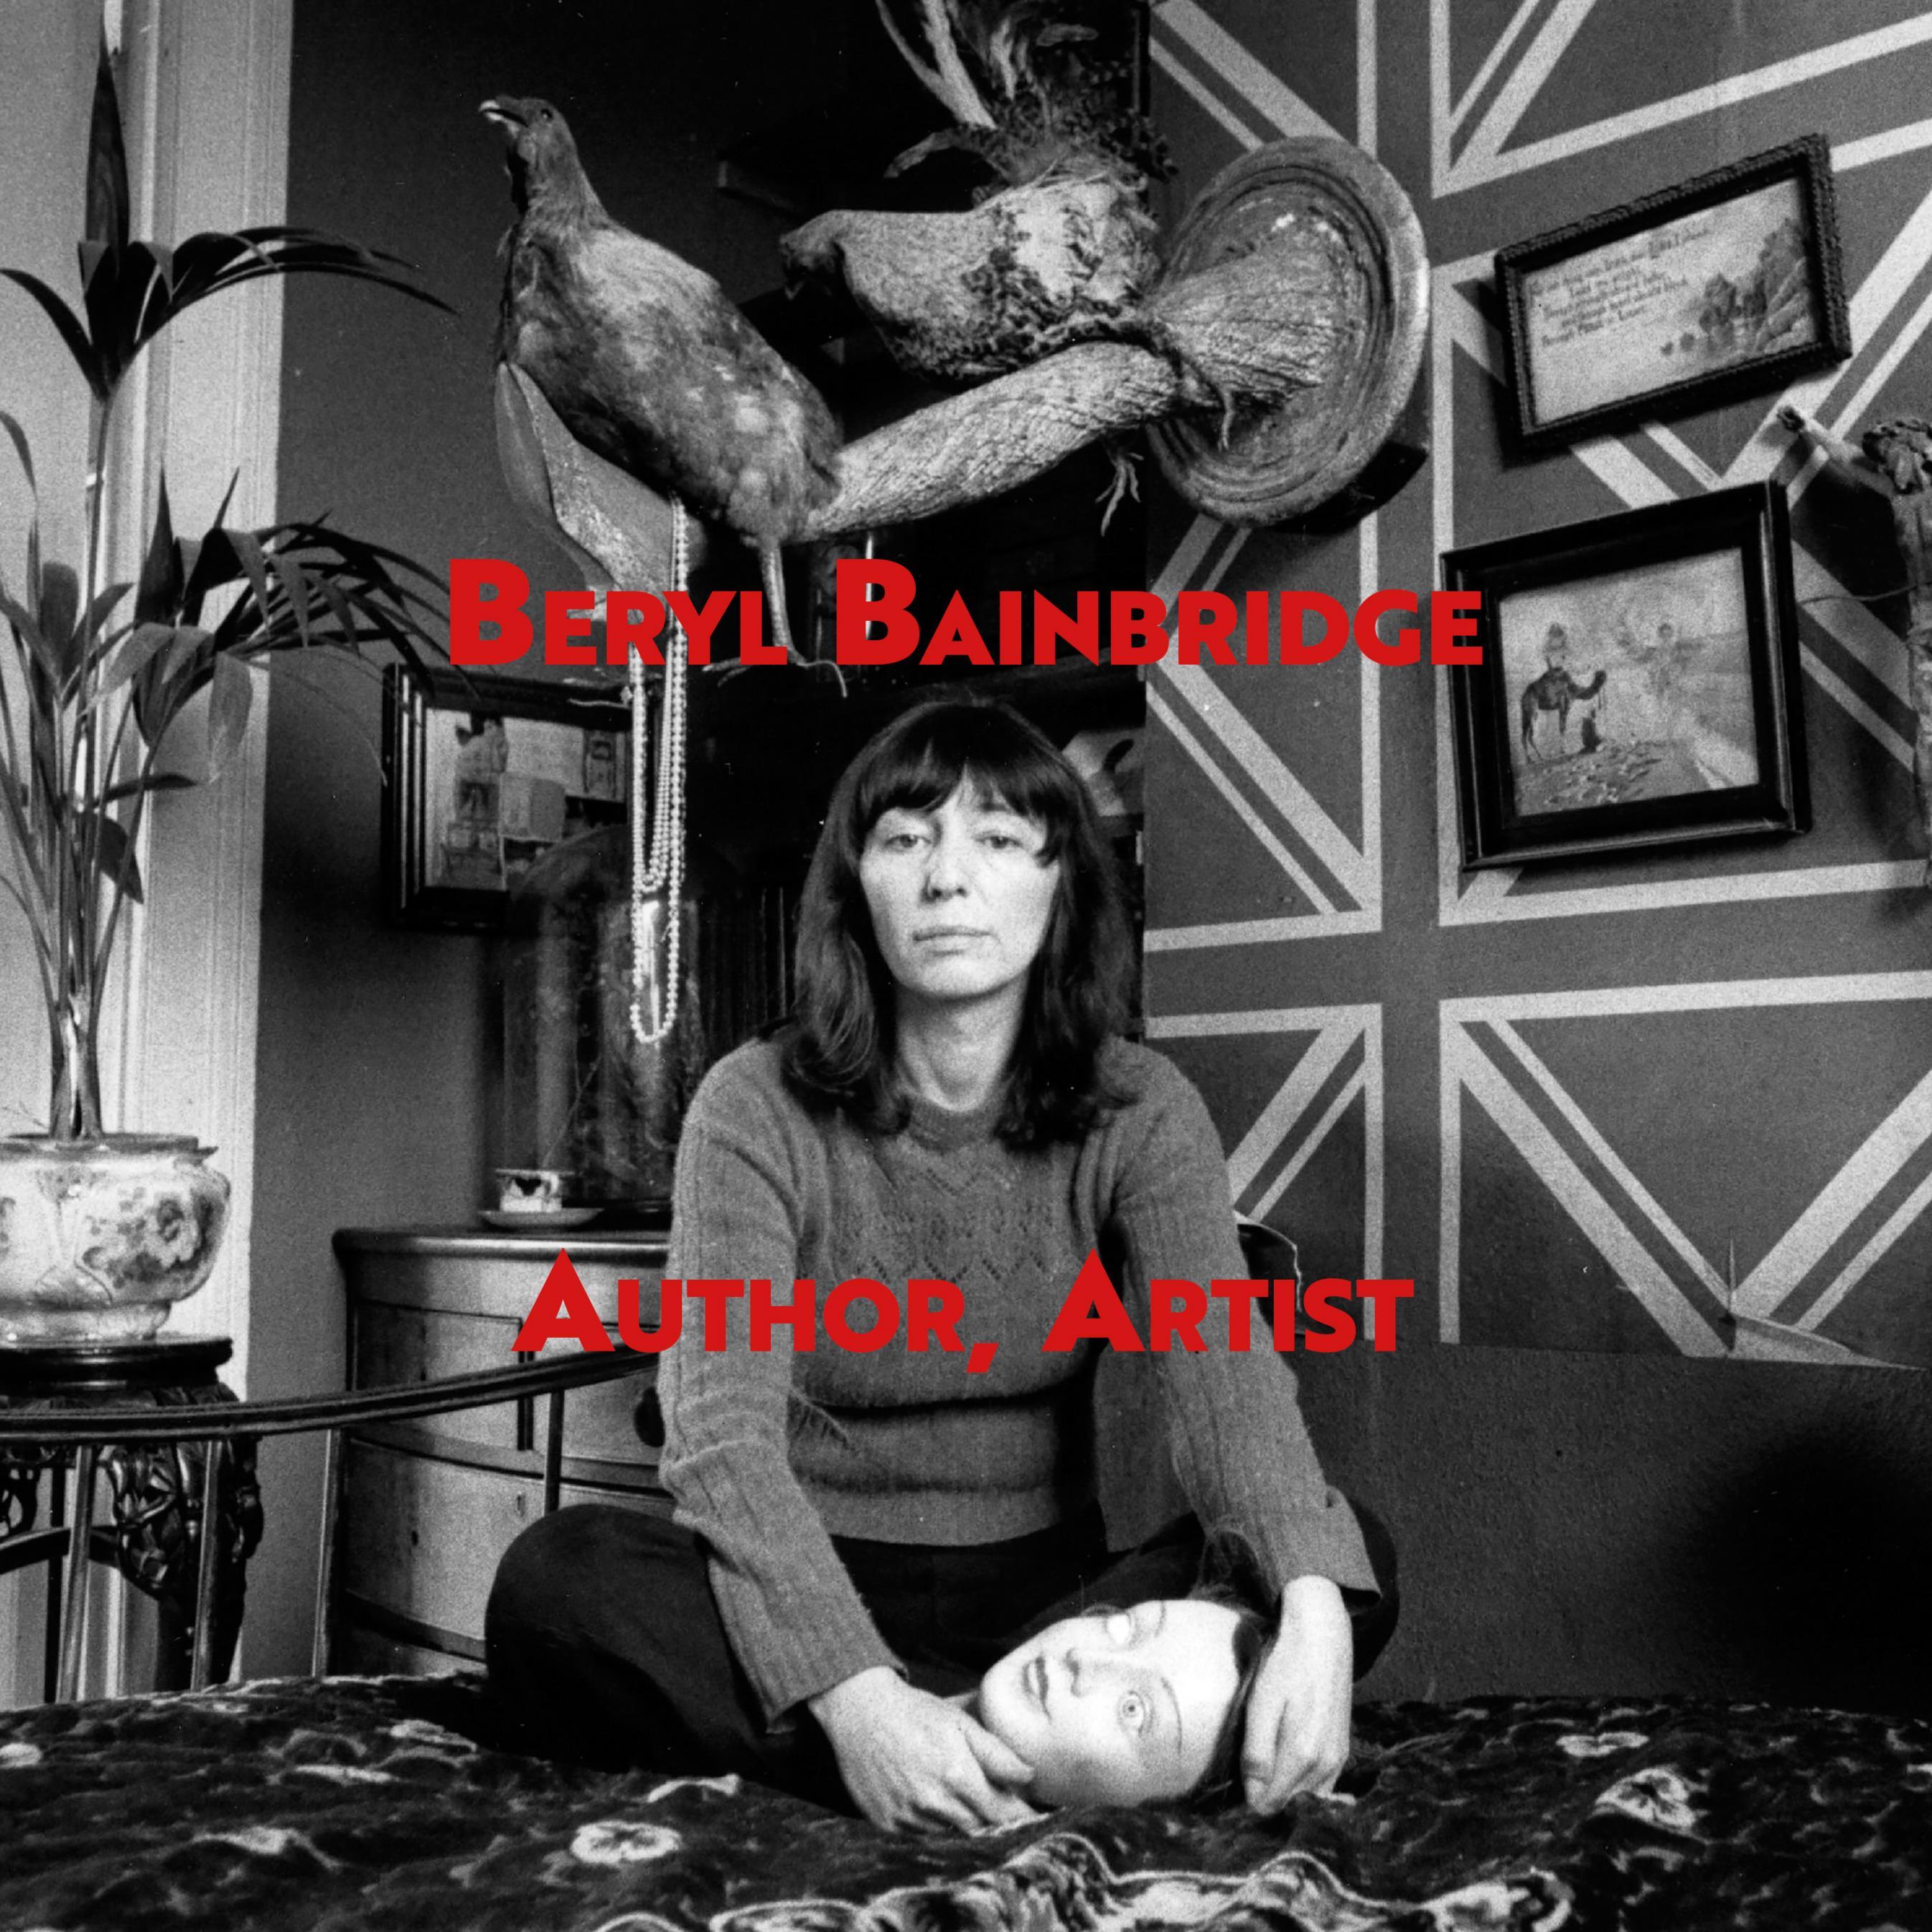 beryl-bainbridge-author-artist